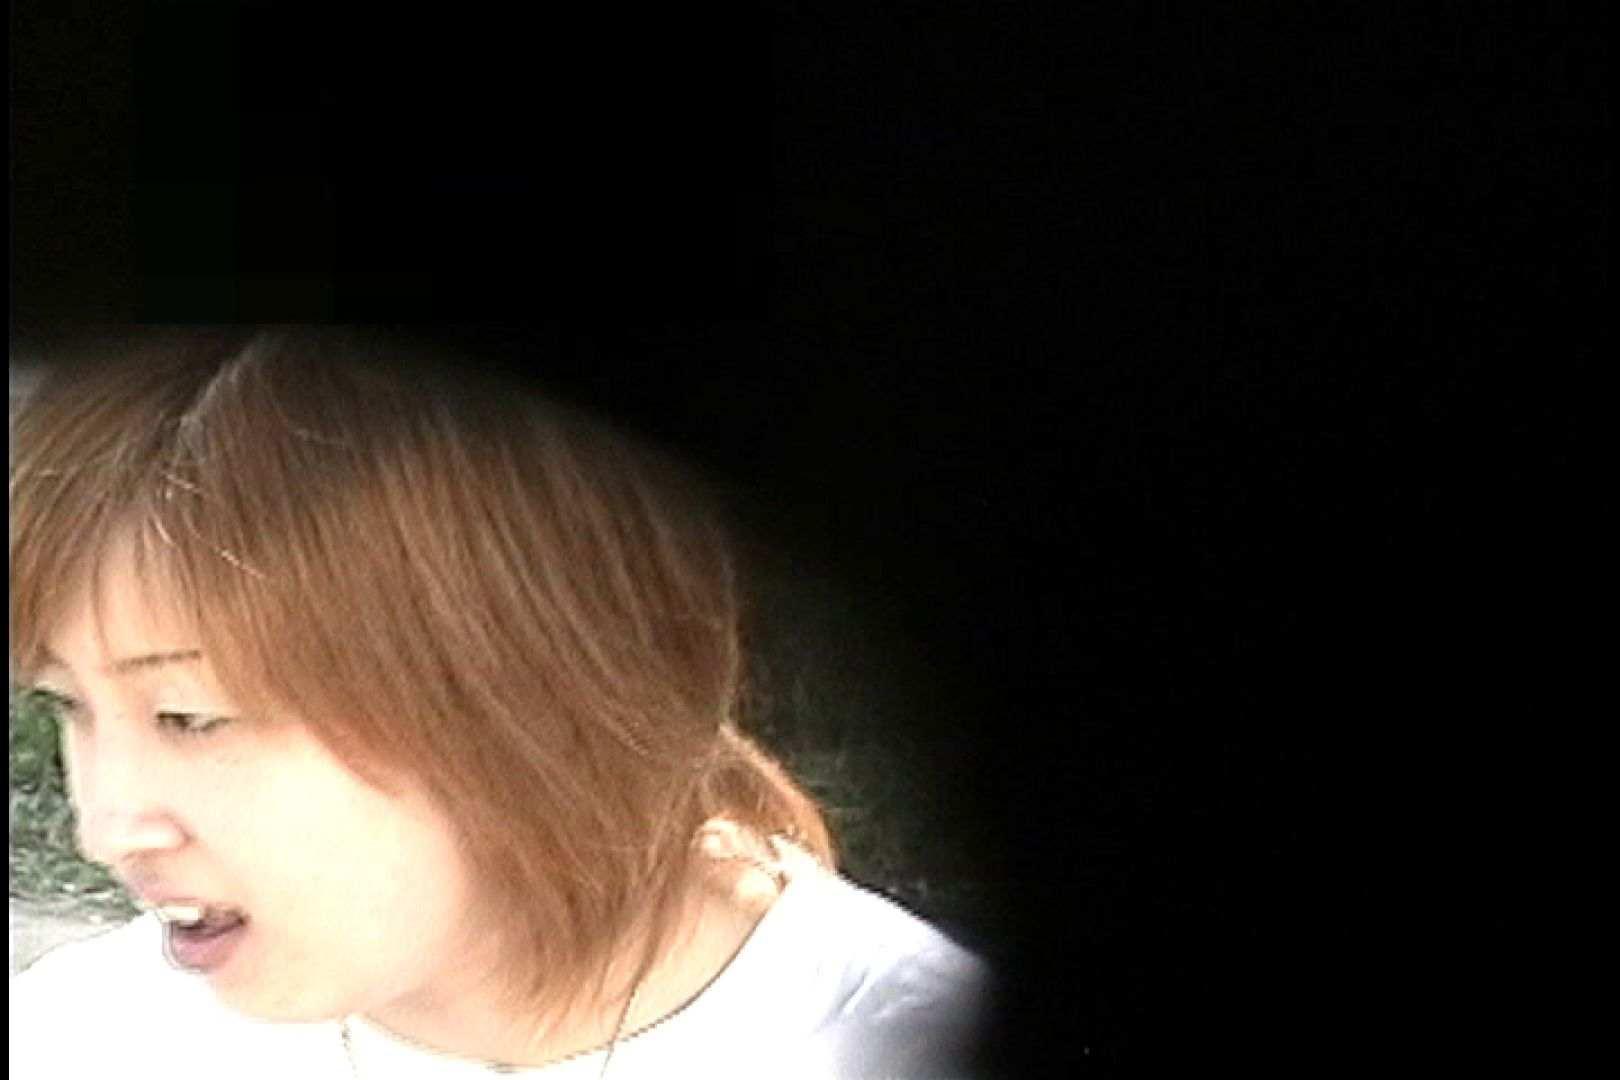 No.41 陰茎から滴り落ちる水滴 美乳 おまんこ無修正動画無料 108枚 31